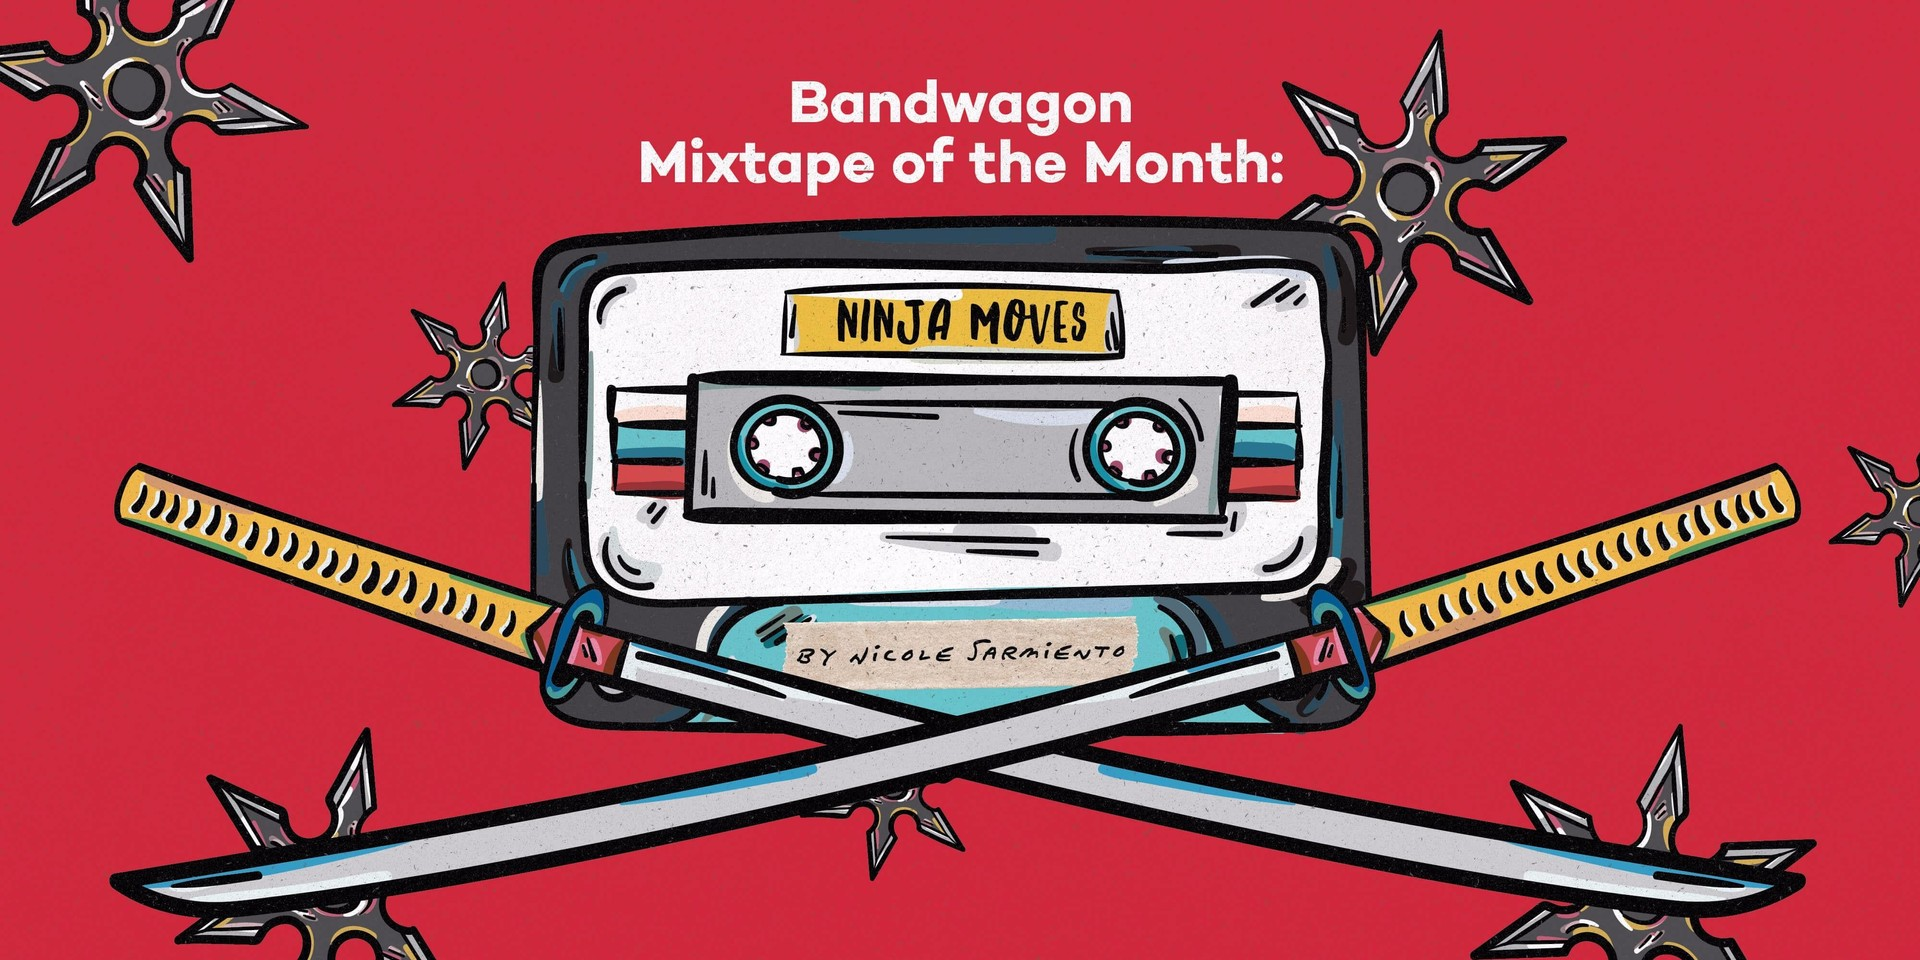 Bandwagon Mixtape of the Month #4.2: Ninja Moves